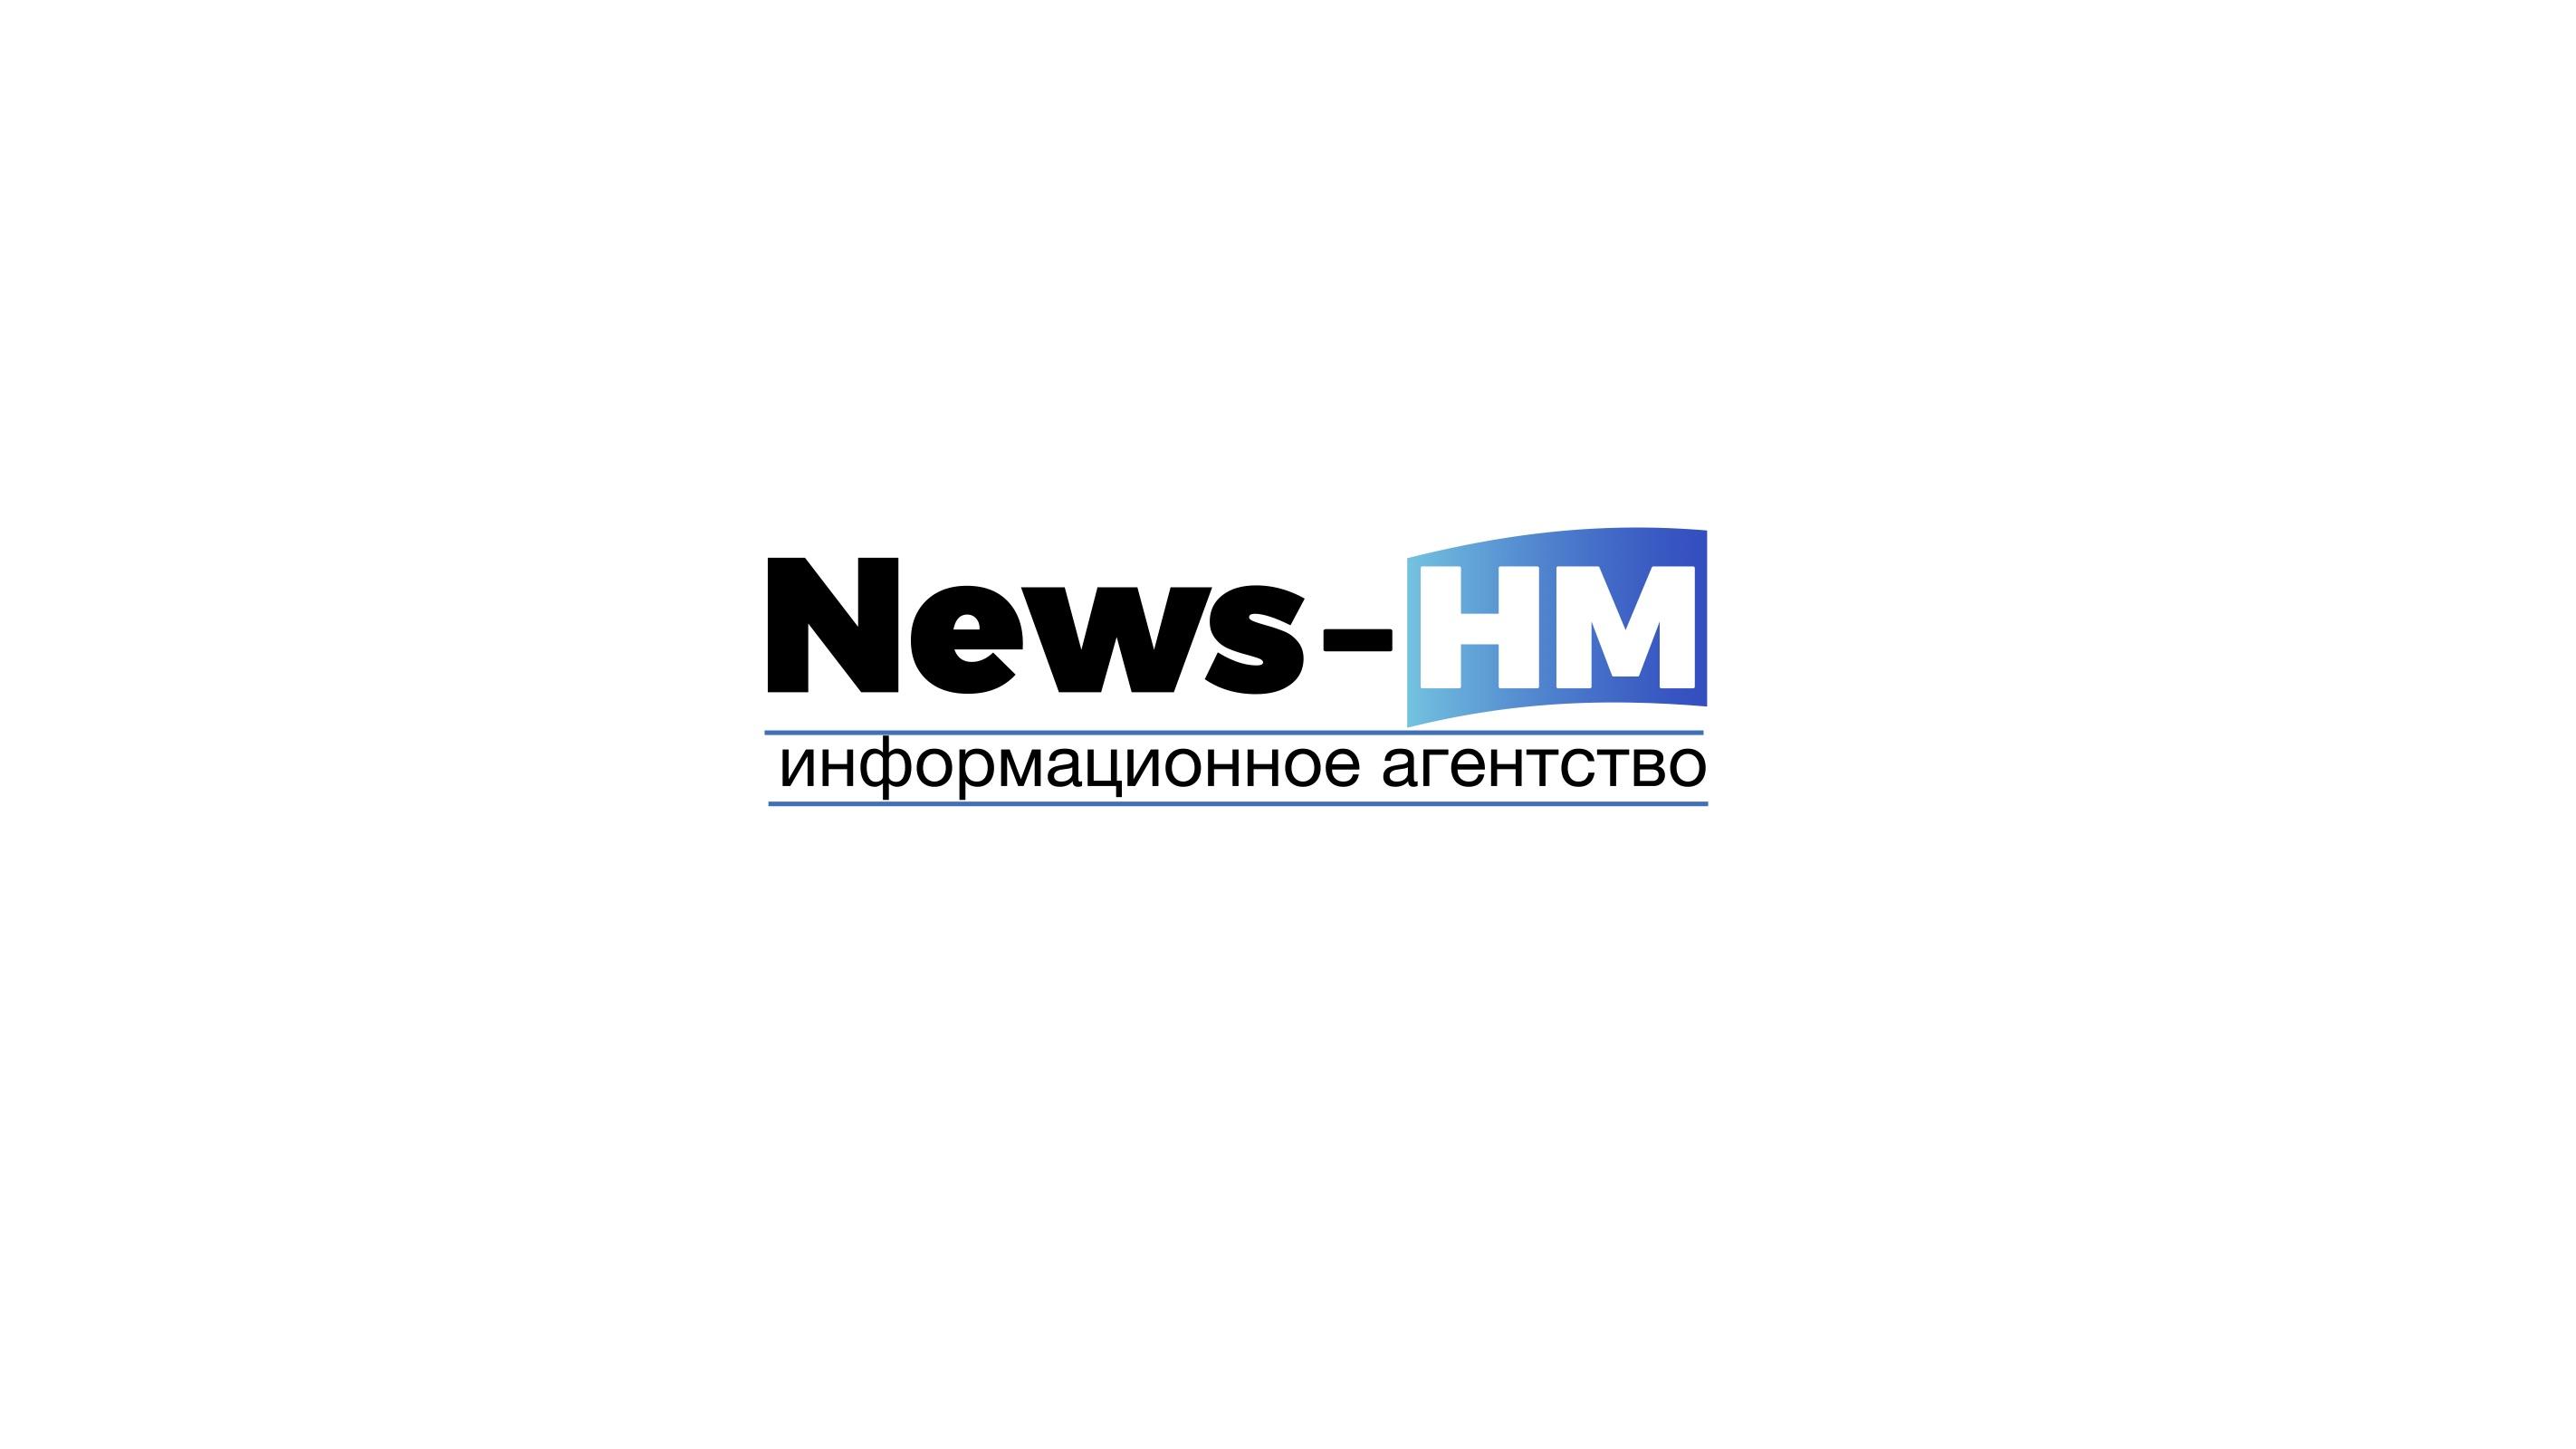 Логотип для информационного агентства фото f_1385aa63ad458148.jpg